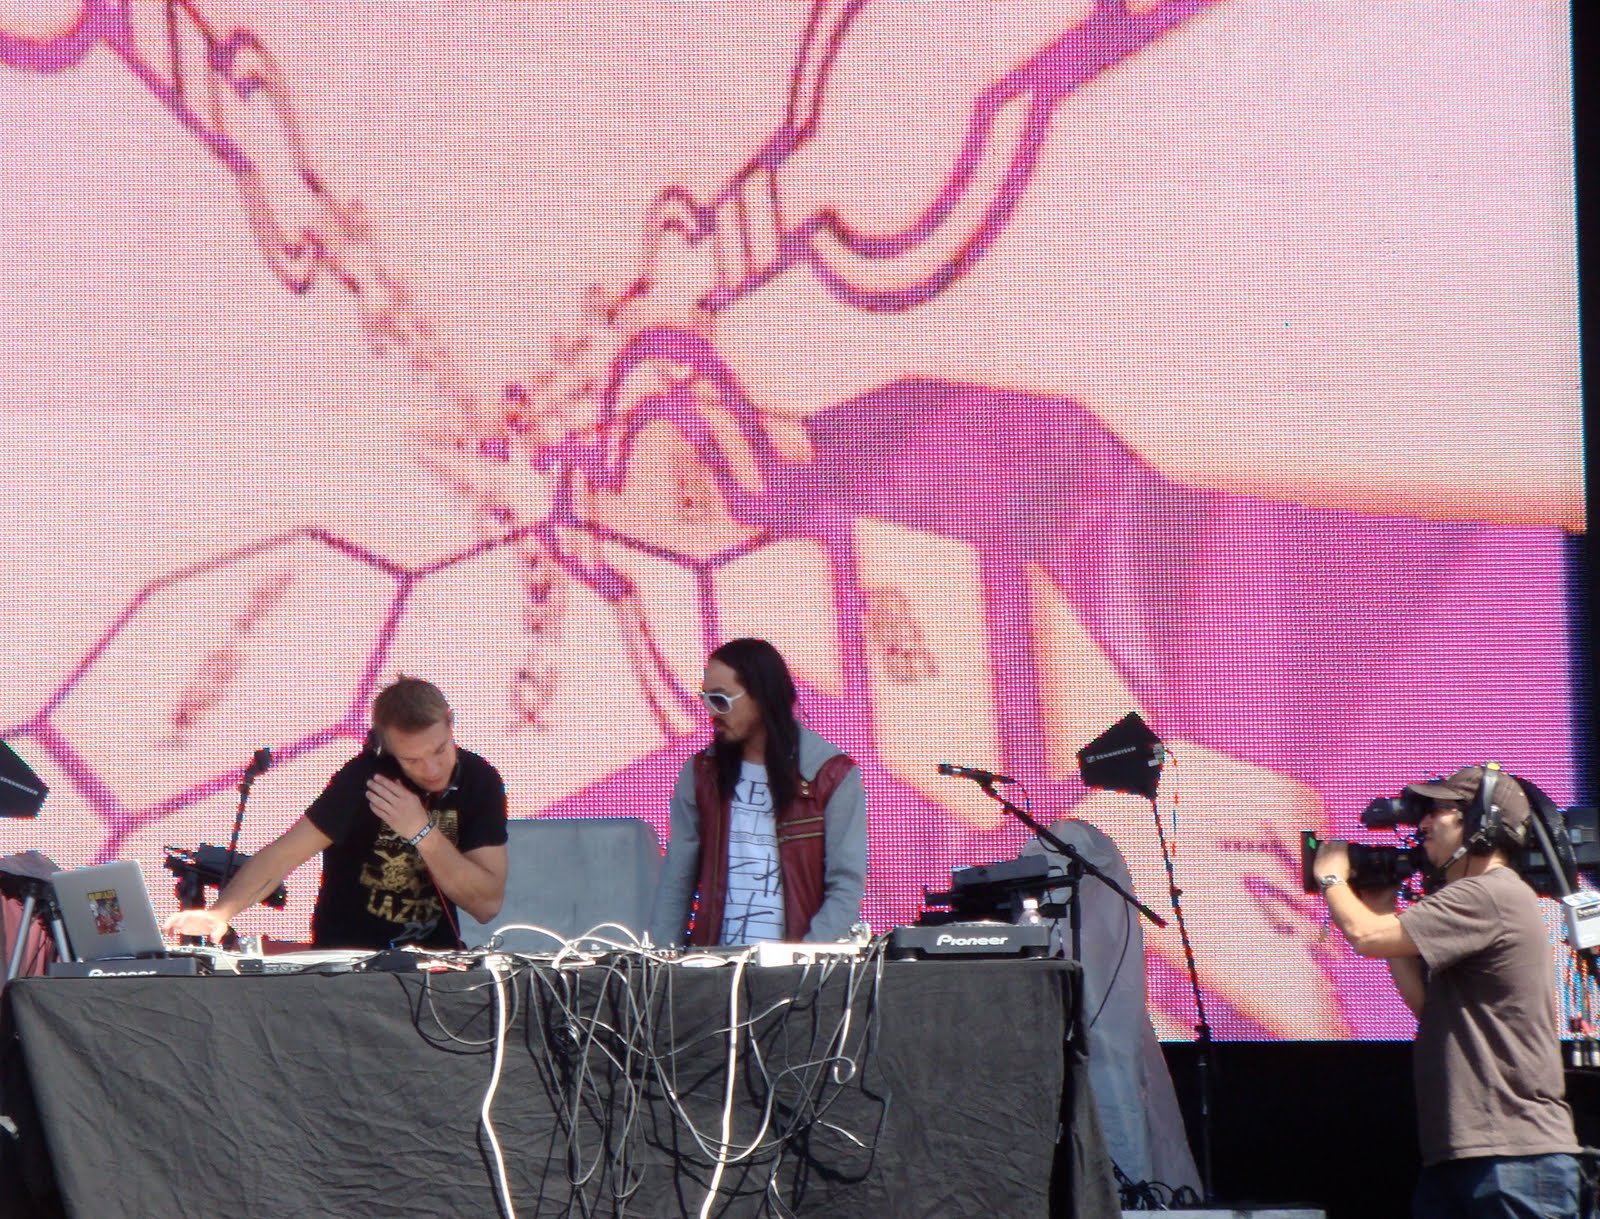 solapalooza  ultra music festival 2010 review